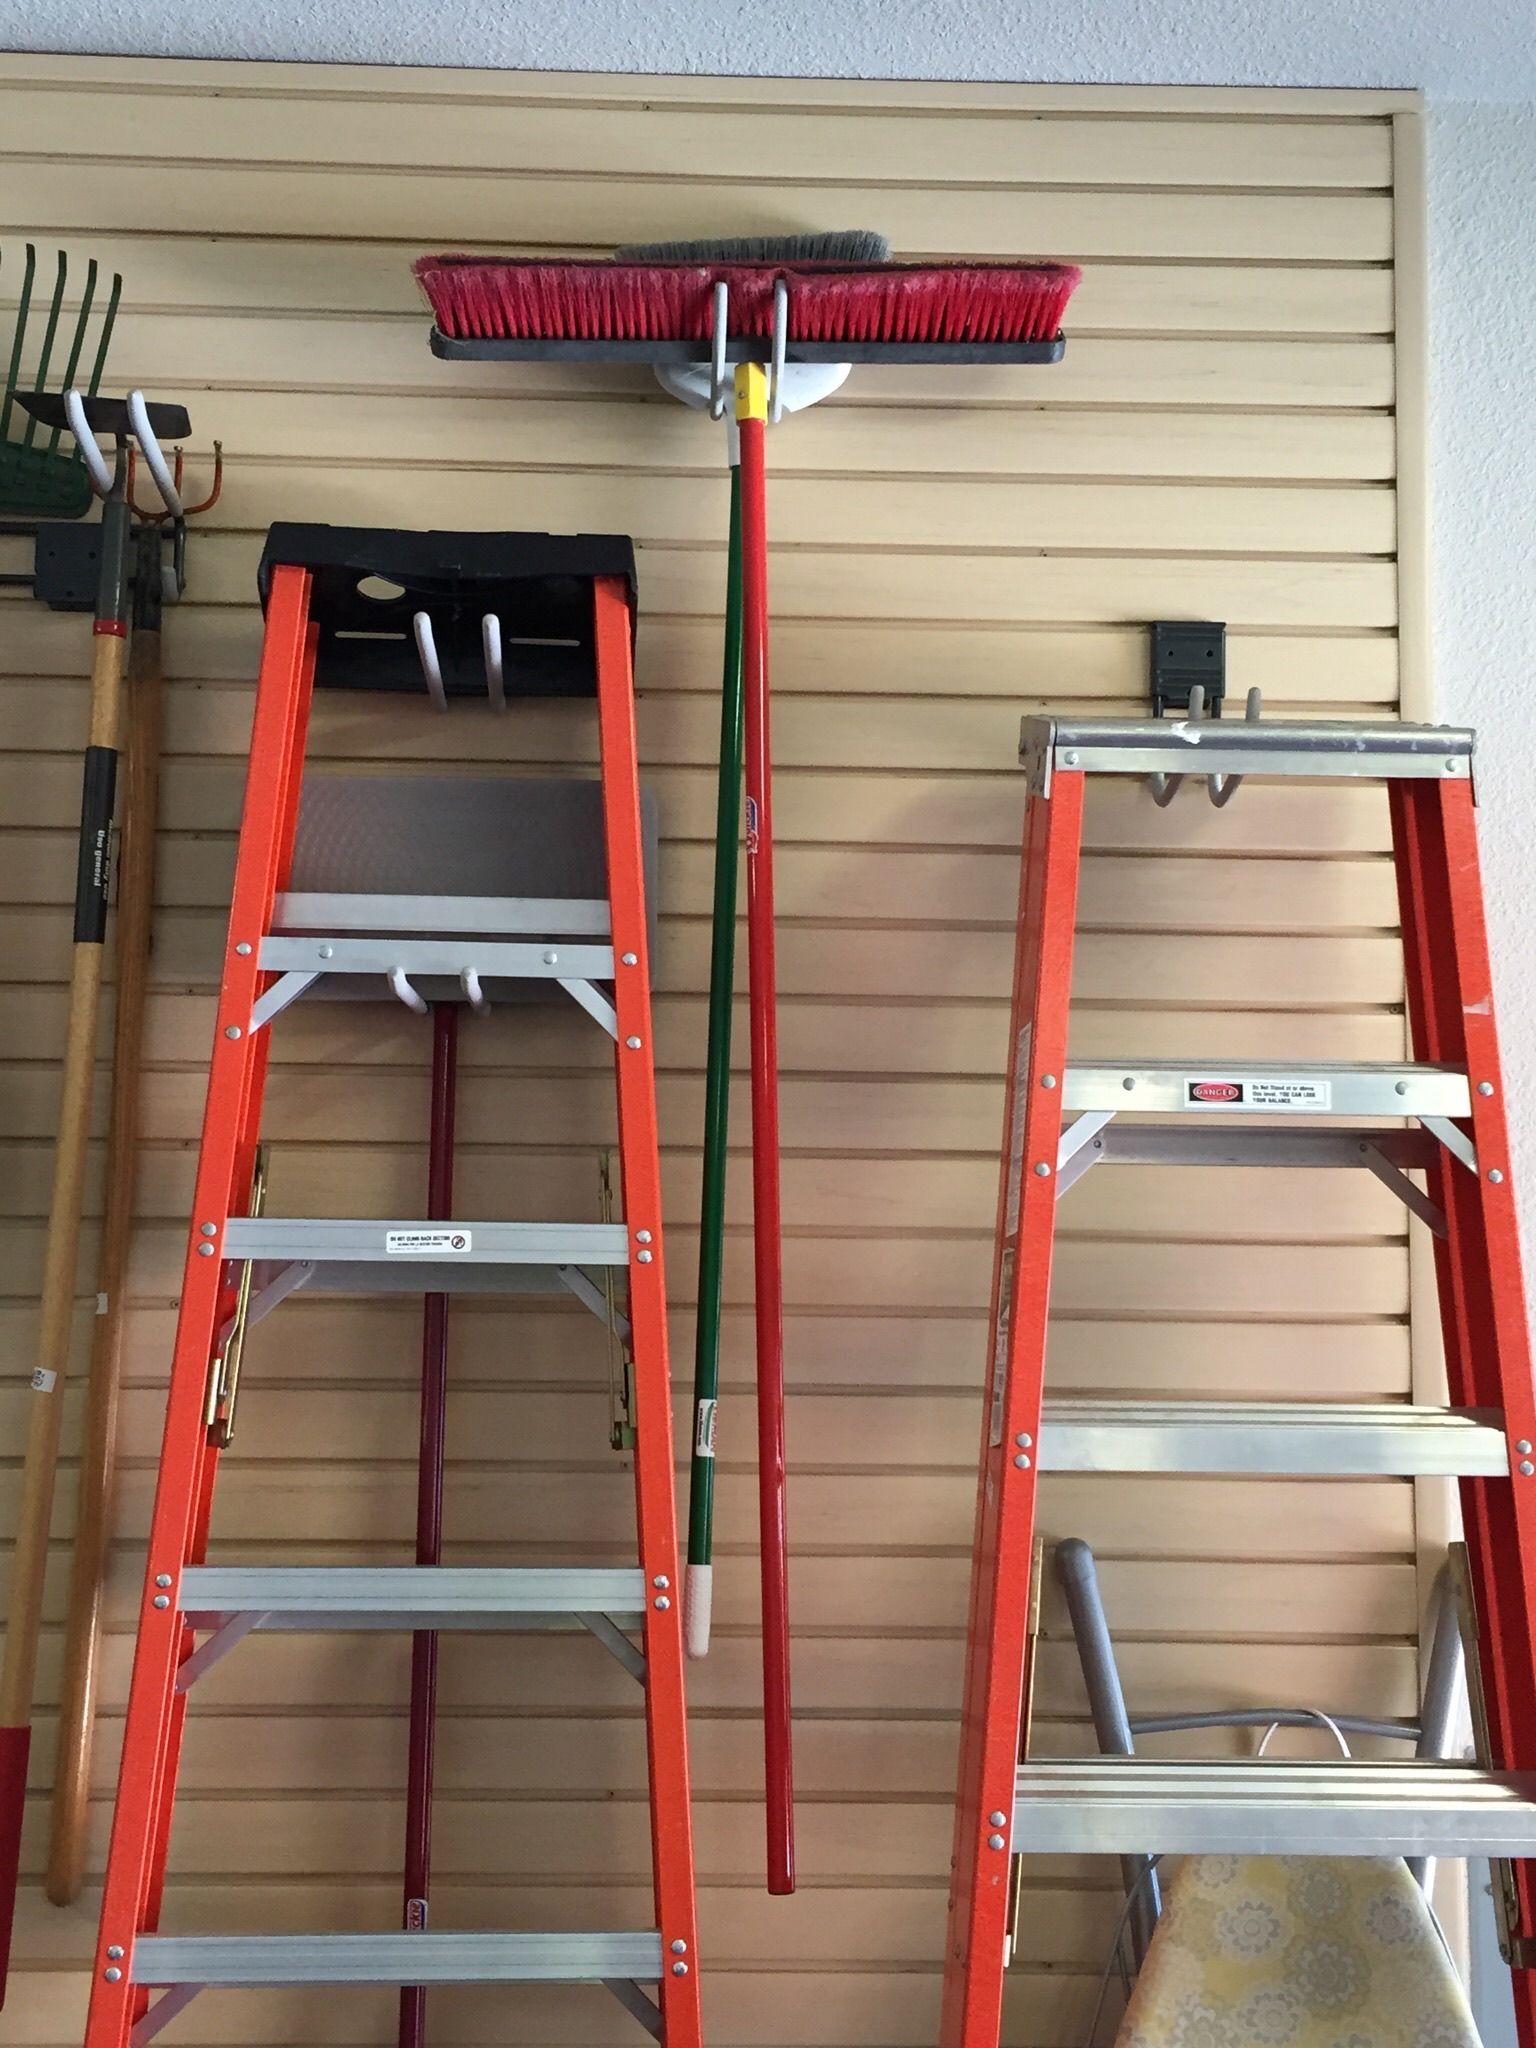 Slatwall Hooks Organize Your Ladders And Tools Garage Organization Slat Wall Ladder